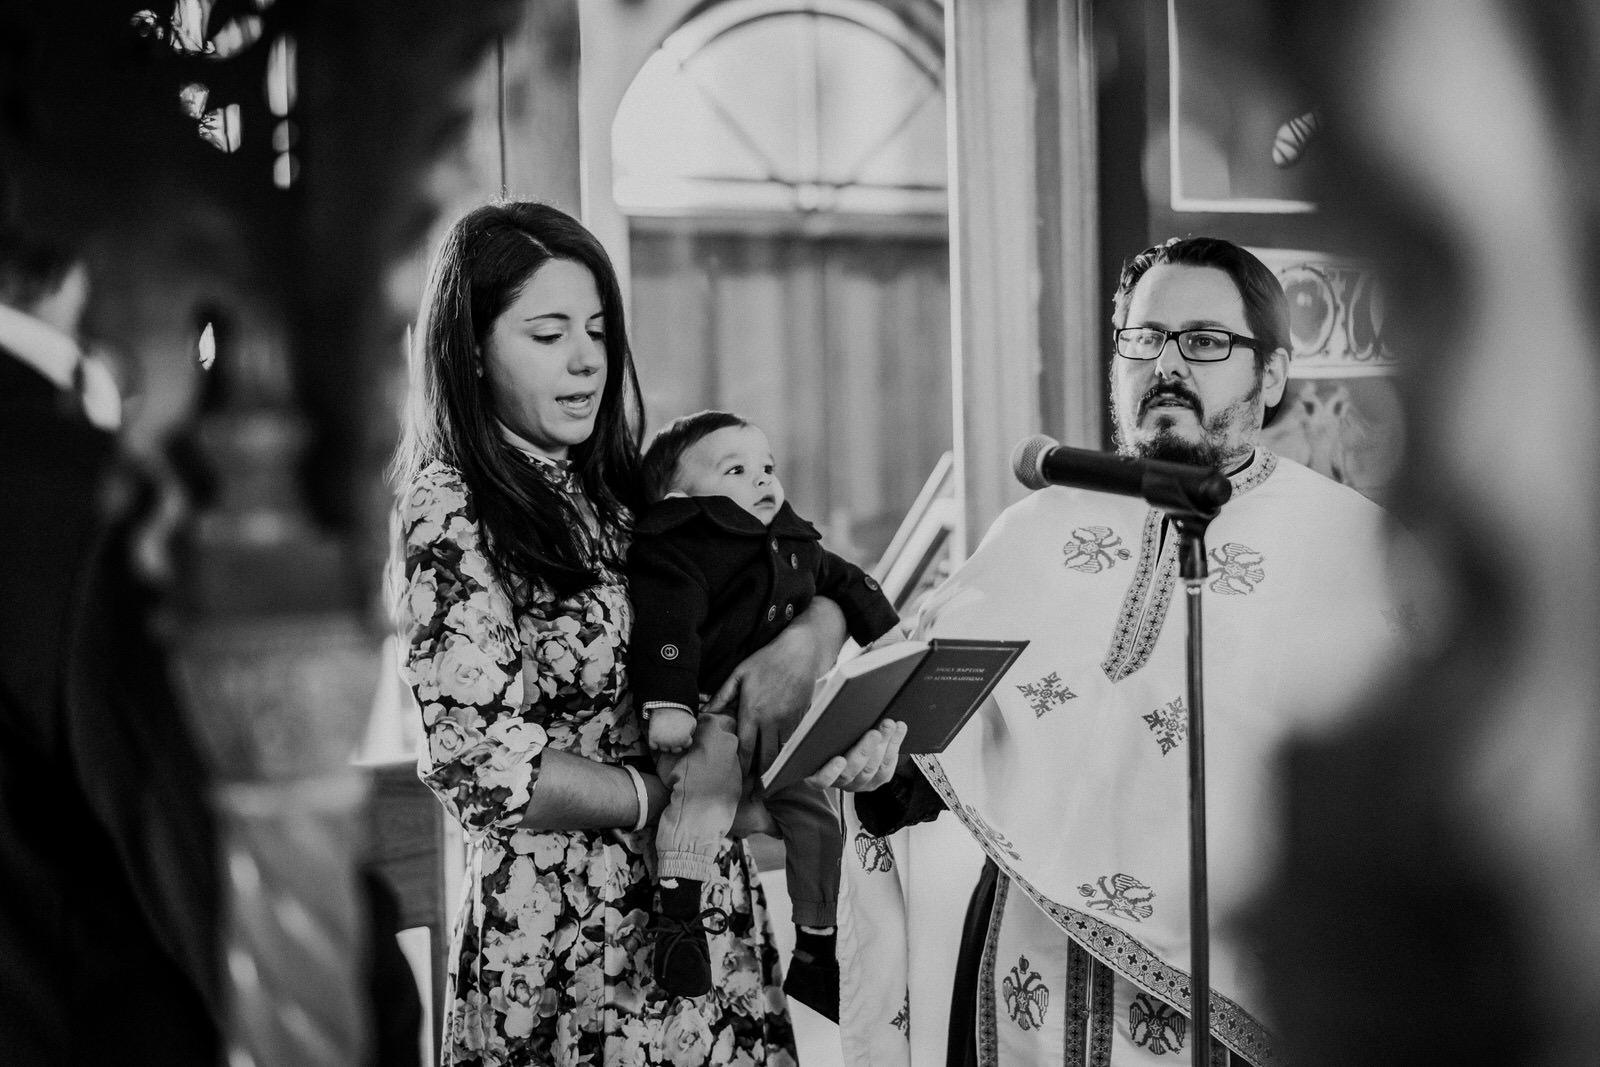 yianni-baptism-st-catherine-orthodox-mascot-laqua-62